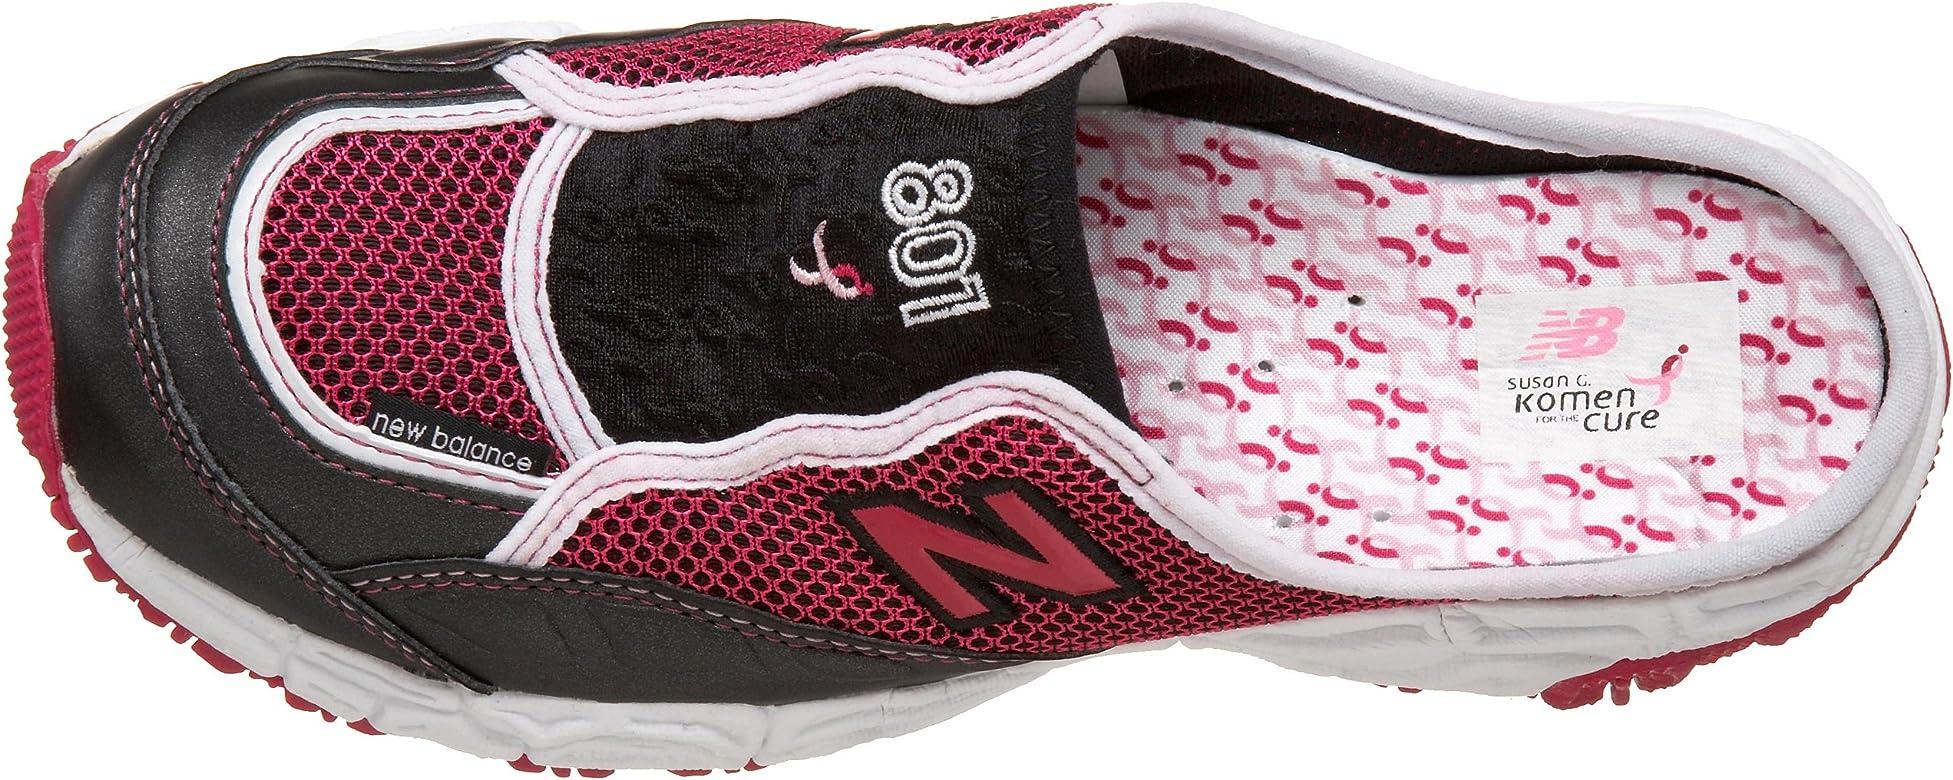 64c74ac059963 Amazon.com   New Balance Women's W801 Sneaker, Black/Pink, 5 D ...